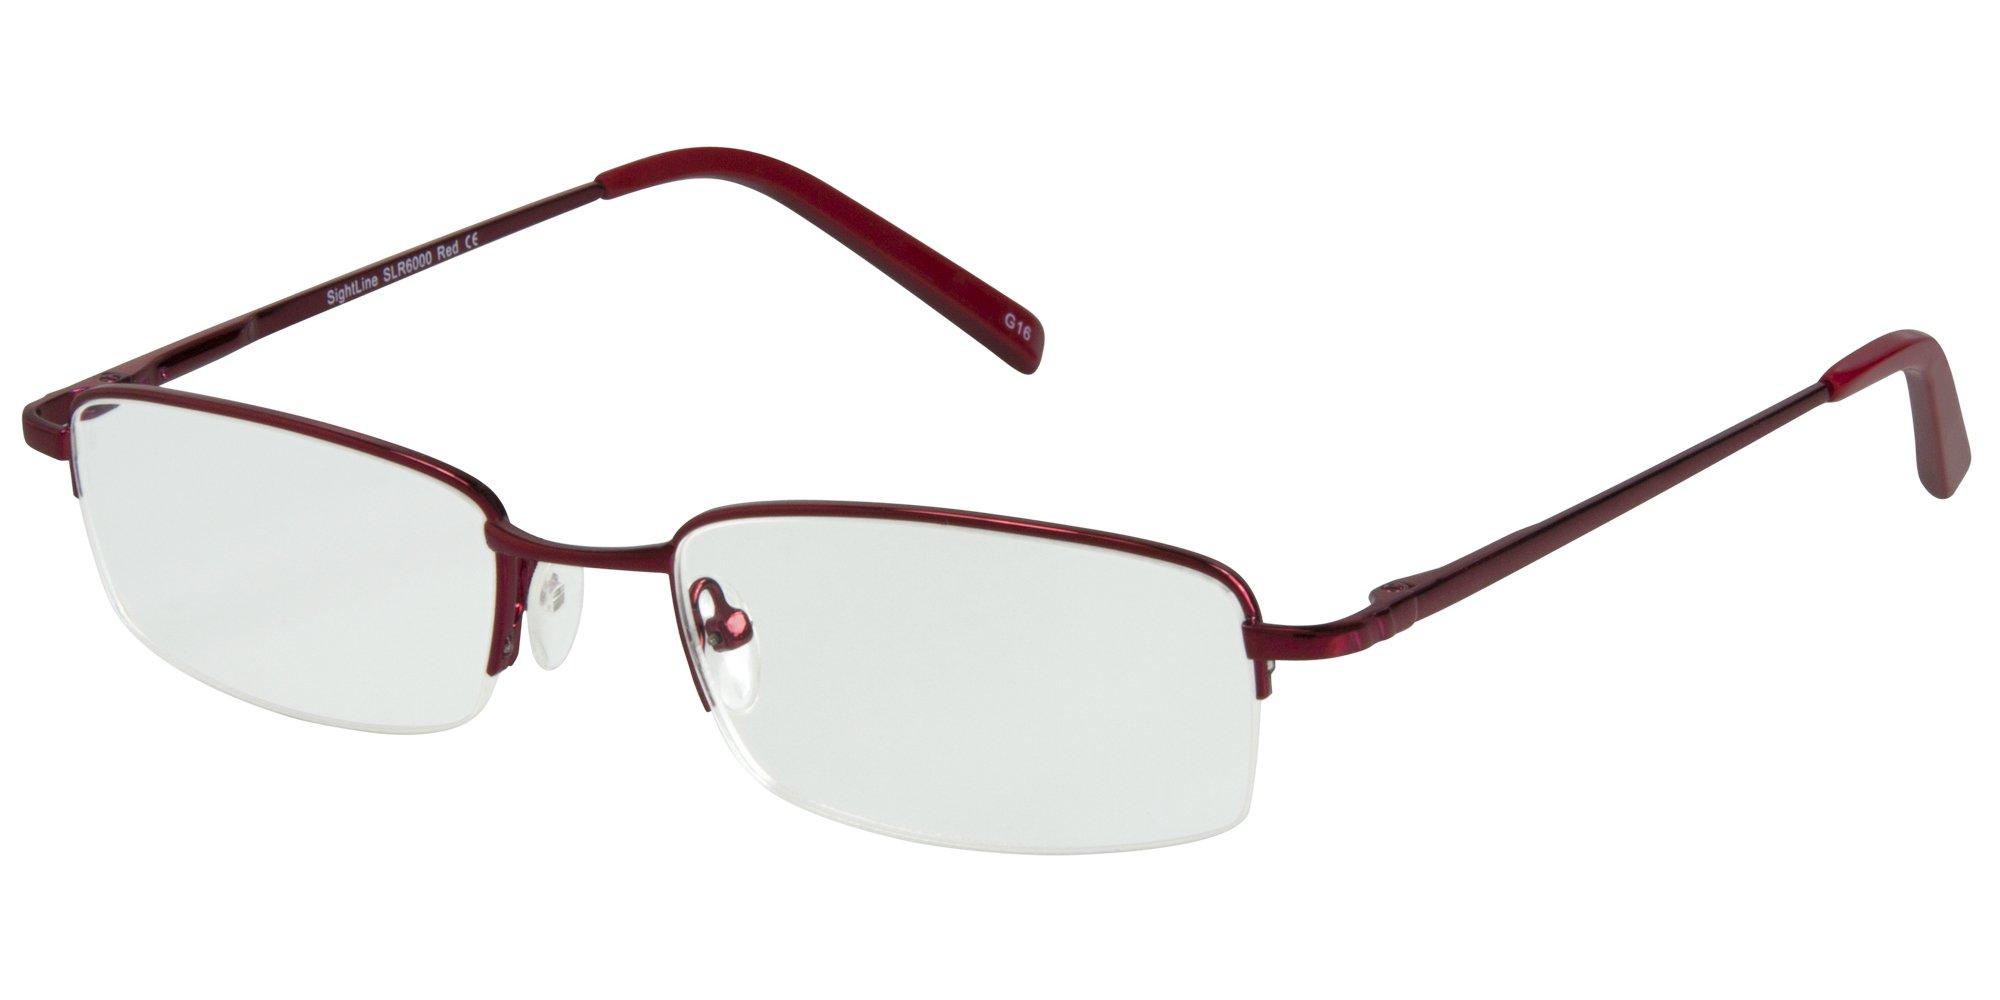 24e232906e3f SightLine Multifocal Computer Reading Glasses 6000 Semi-Rimless Designer  Frames (1.50